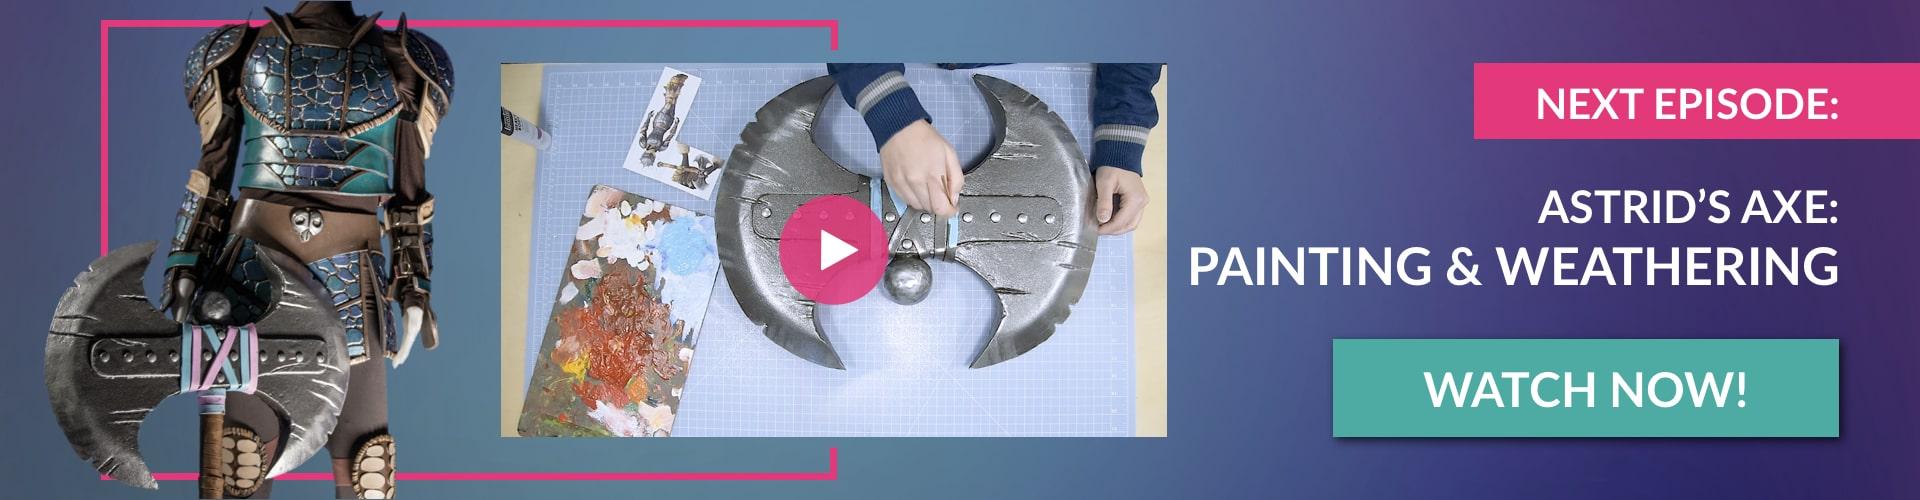 CosBond-Astrid-Axe2-Next-Episode-Axe-Painting-min